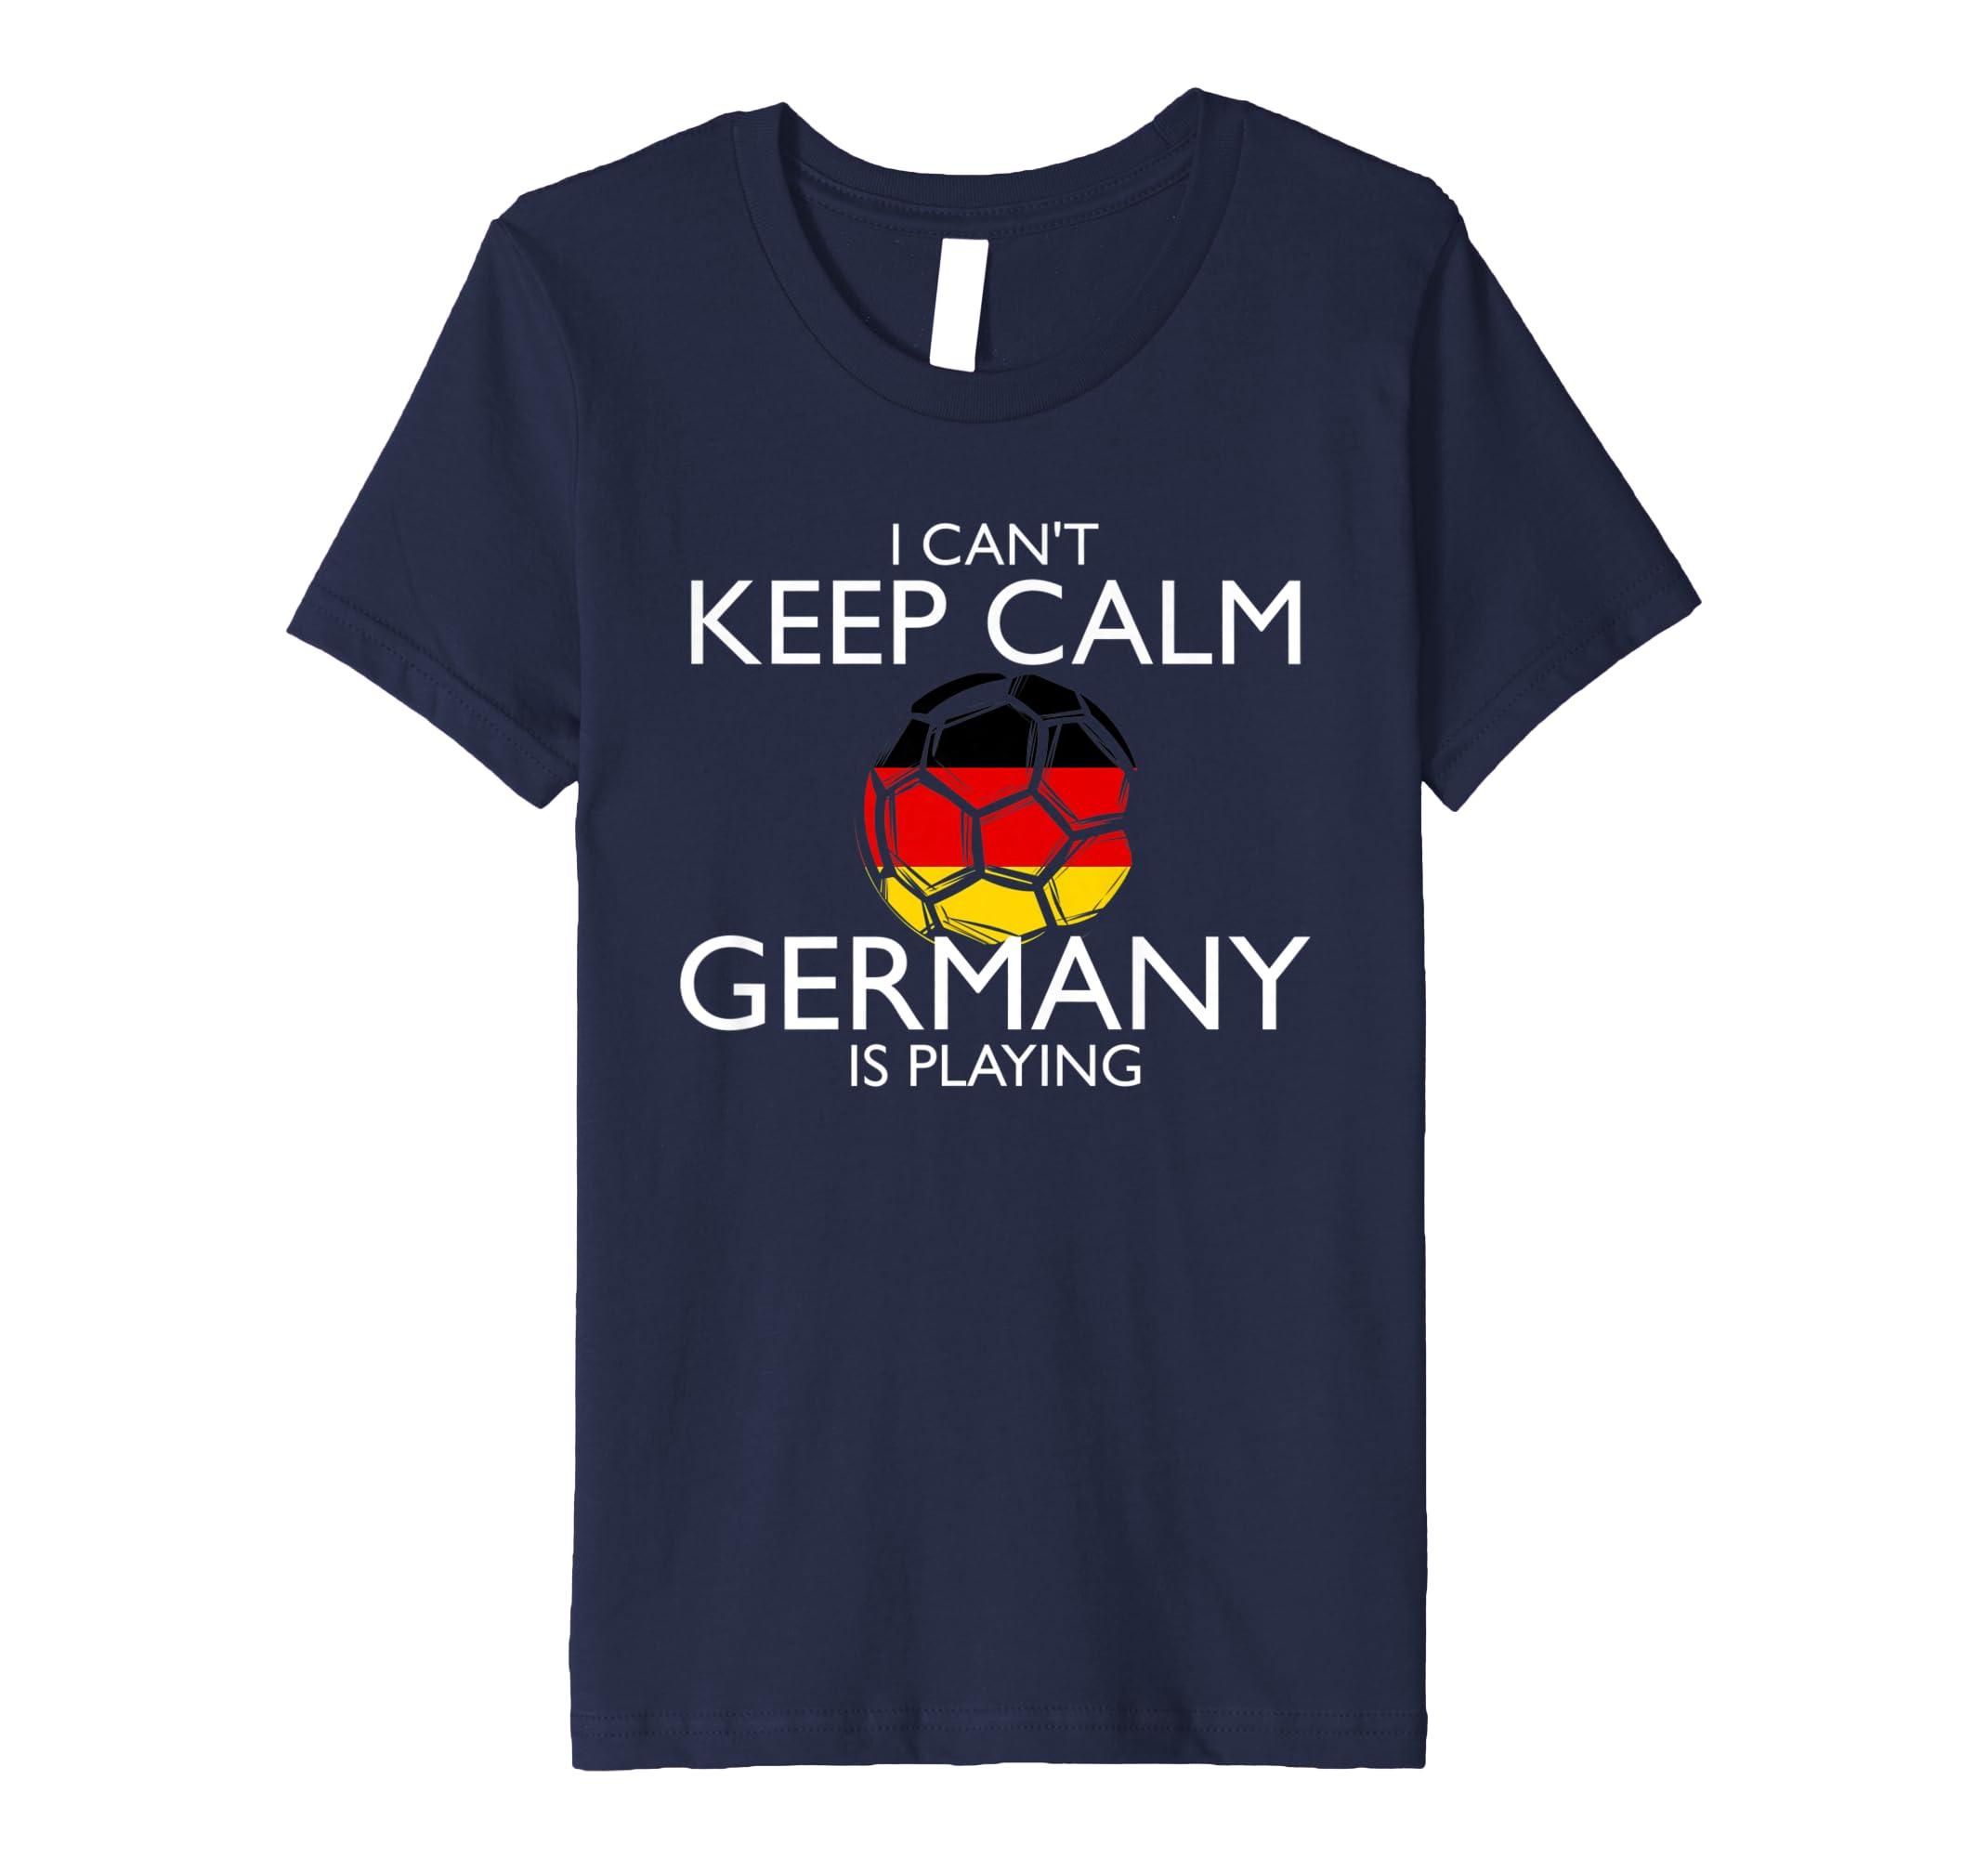 788b5de4319 Amazon.com  Germany Football Jersey 2018 German Soccer T-Shirt  Clothing